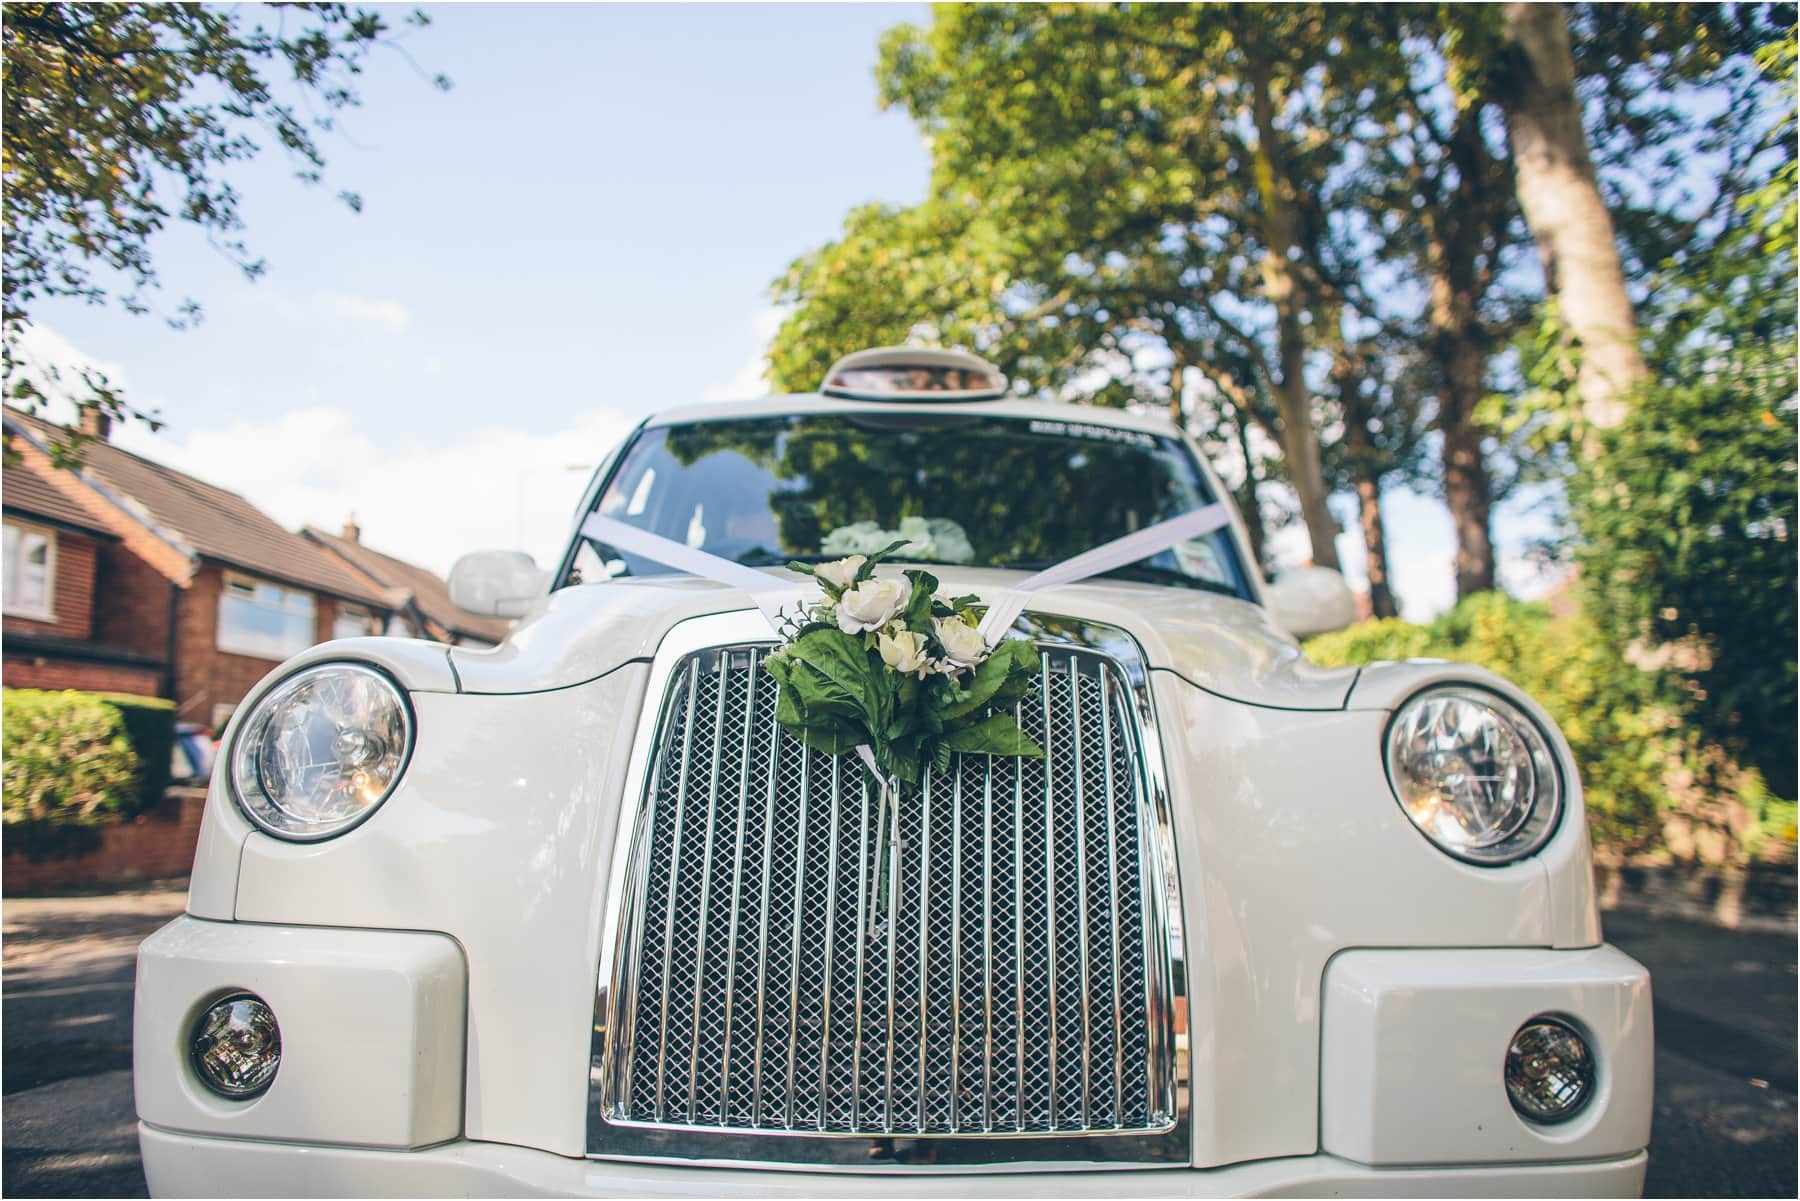 Midland_Manchester_Wedding_Photography_0018